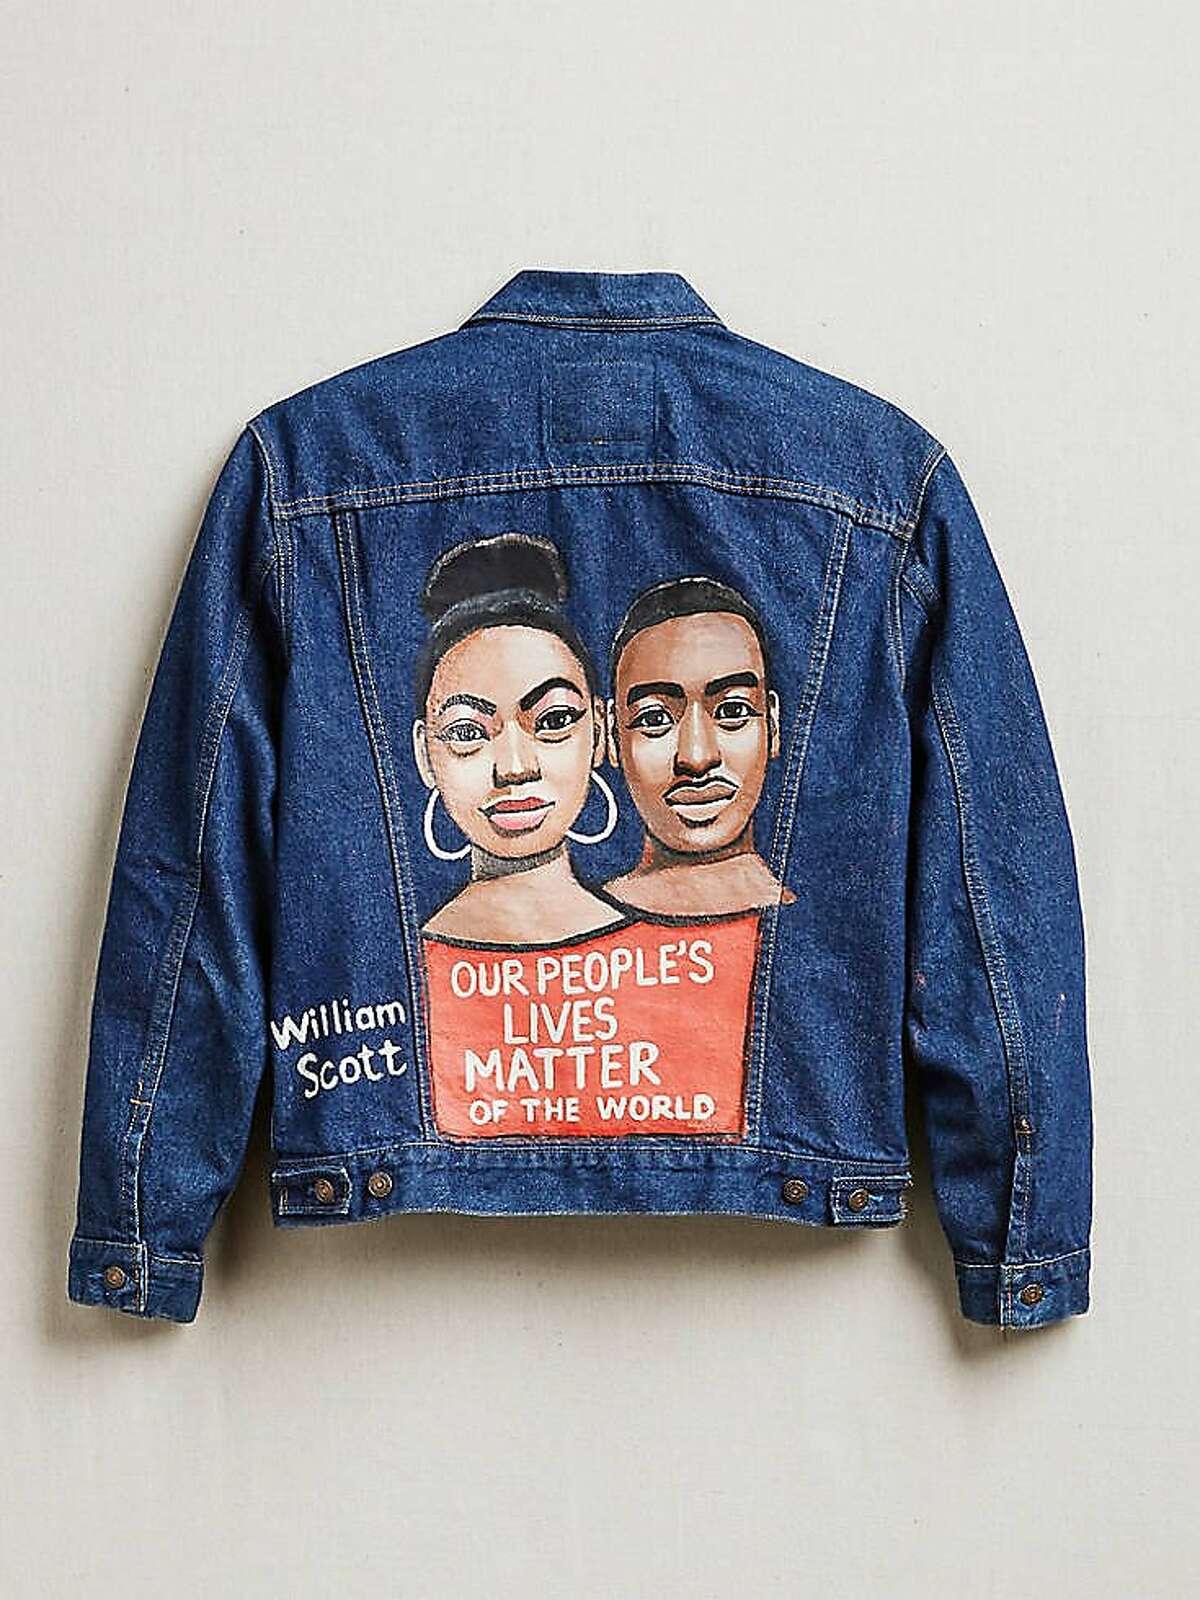 Levi's x Creative Growth fashion collaboration featuring work by artist William Scott on a vintage trucker jacket.